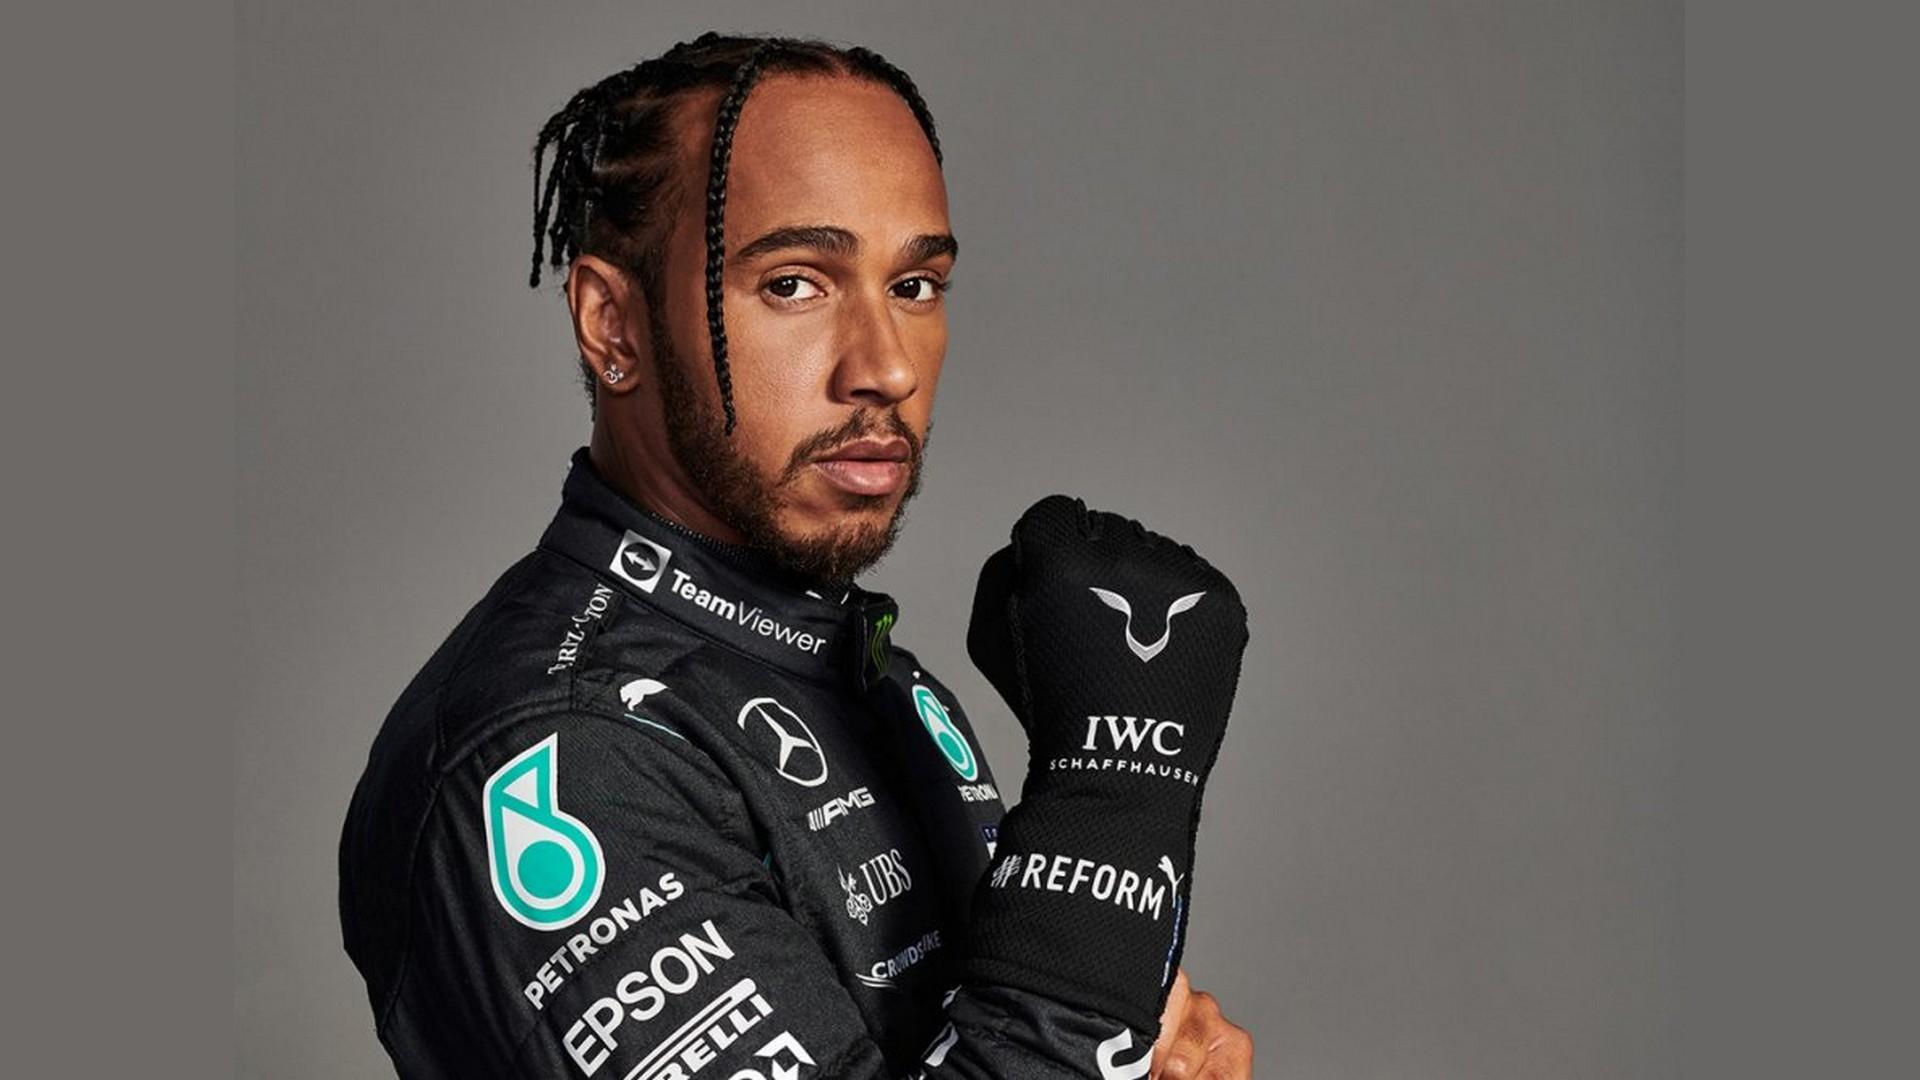 Lewis Hamilton x Team Viewer (Mercedes) 2021 (c)